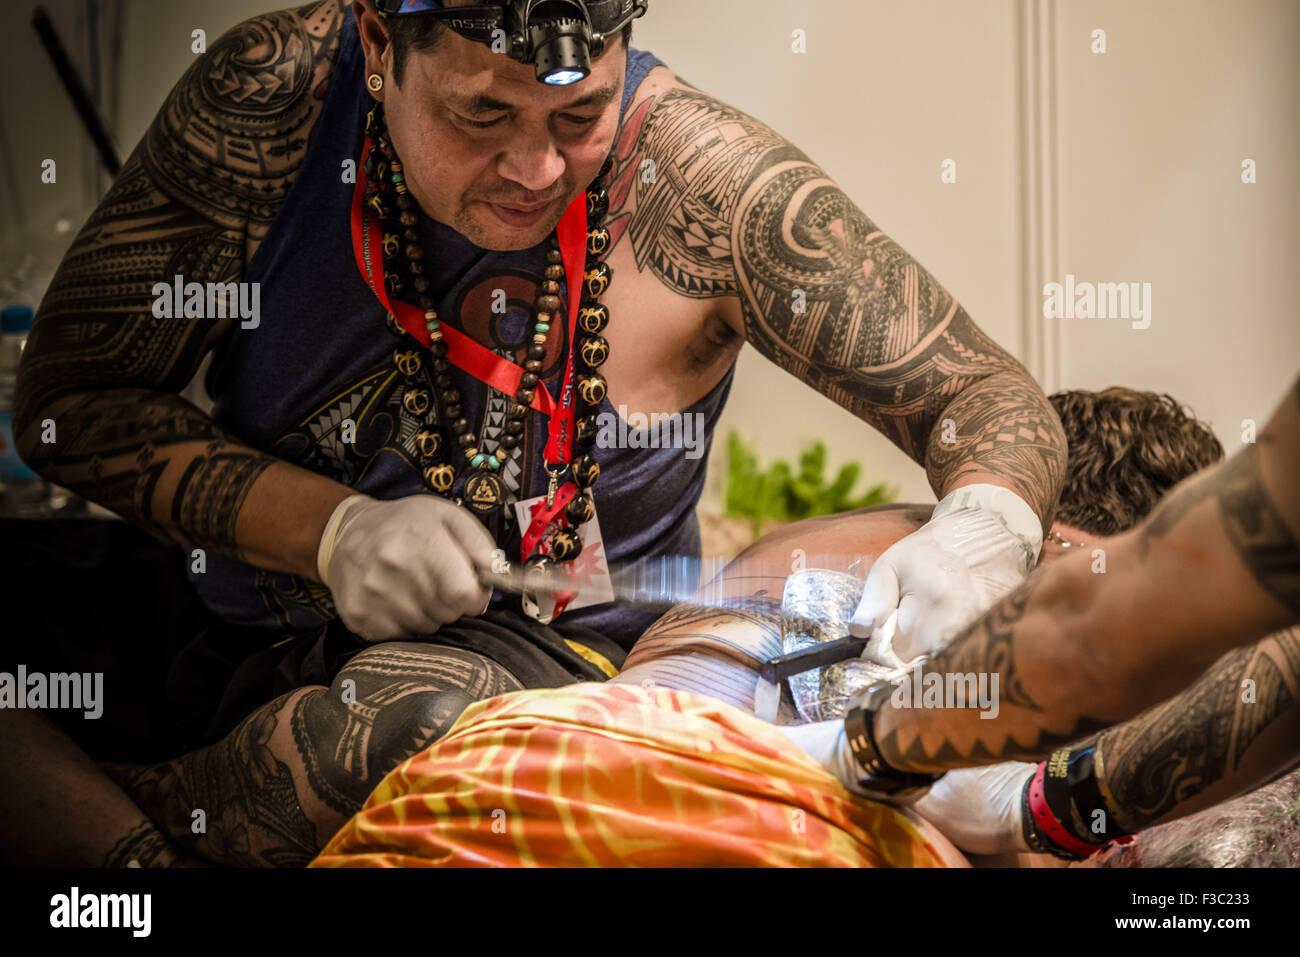 Samoan Tattoo Stock Photos Samoan Tattoo Stock Images Alamy